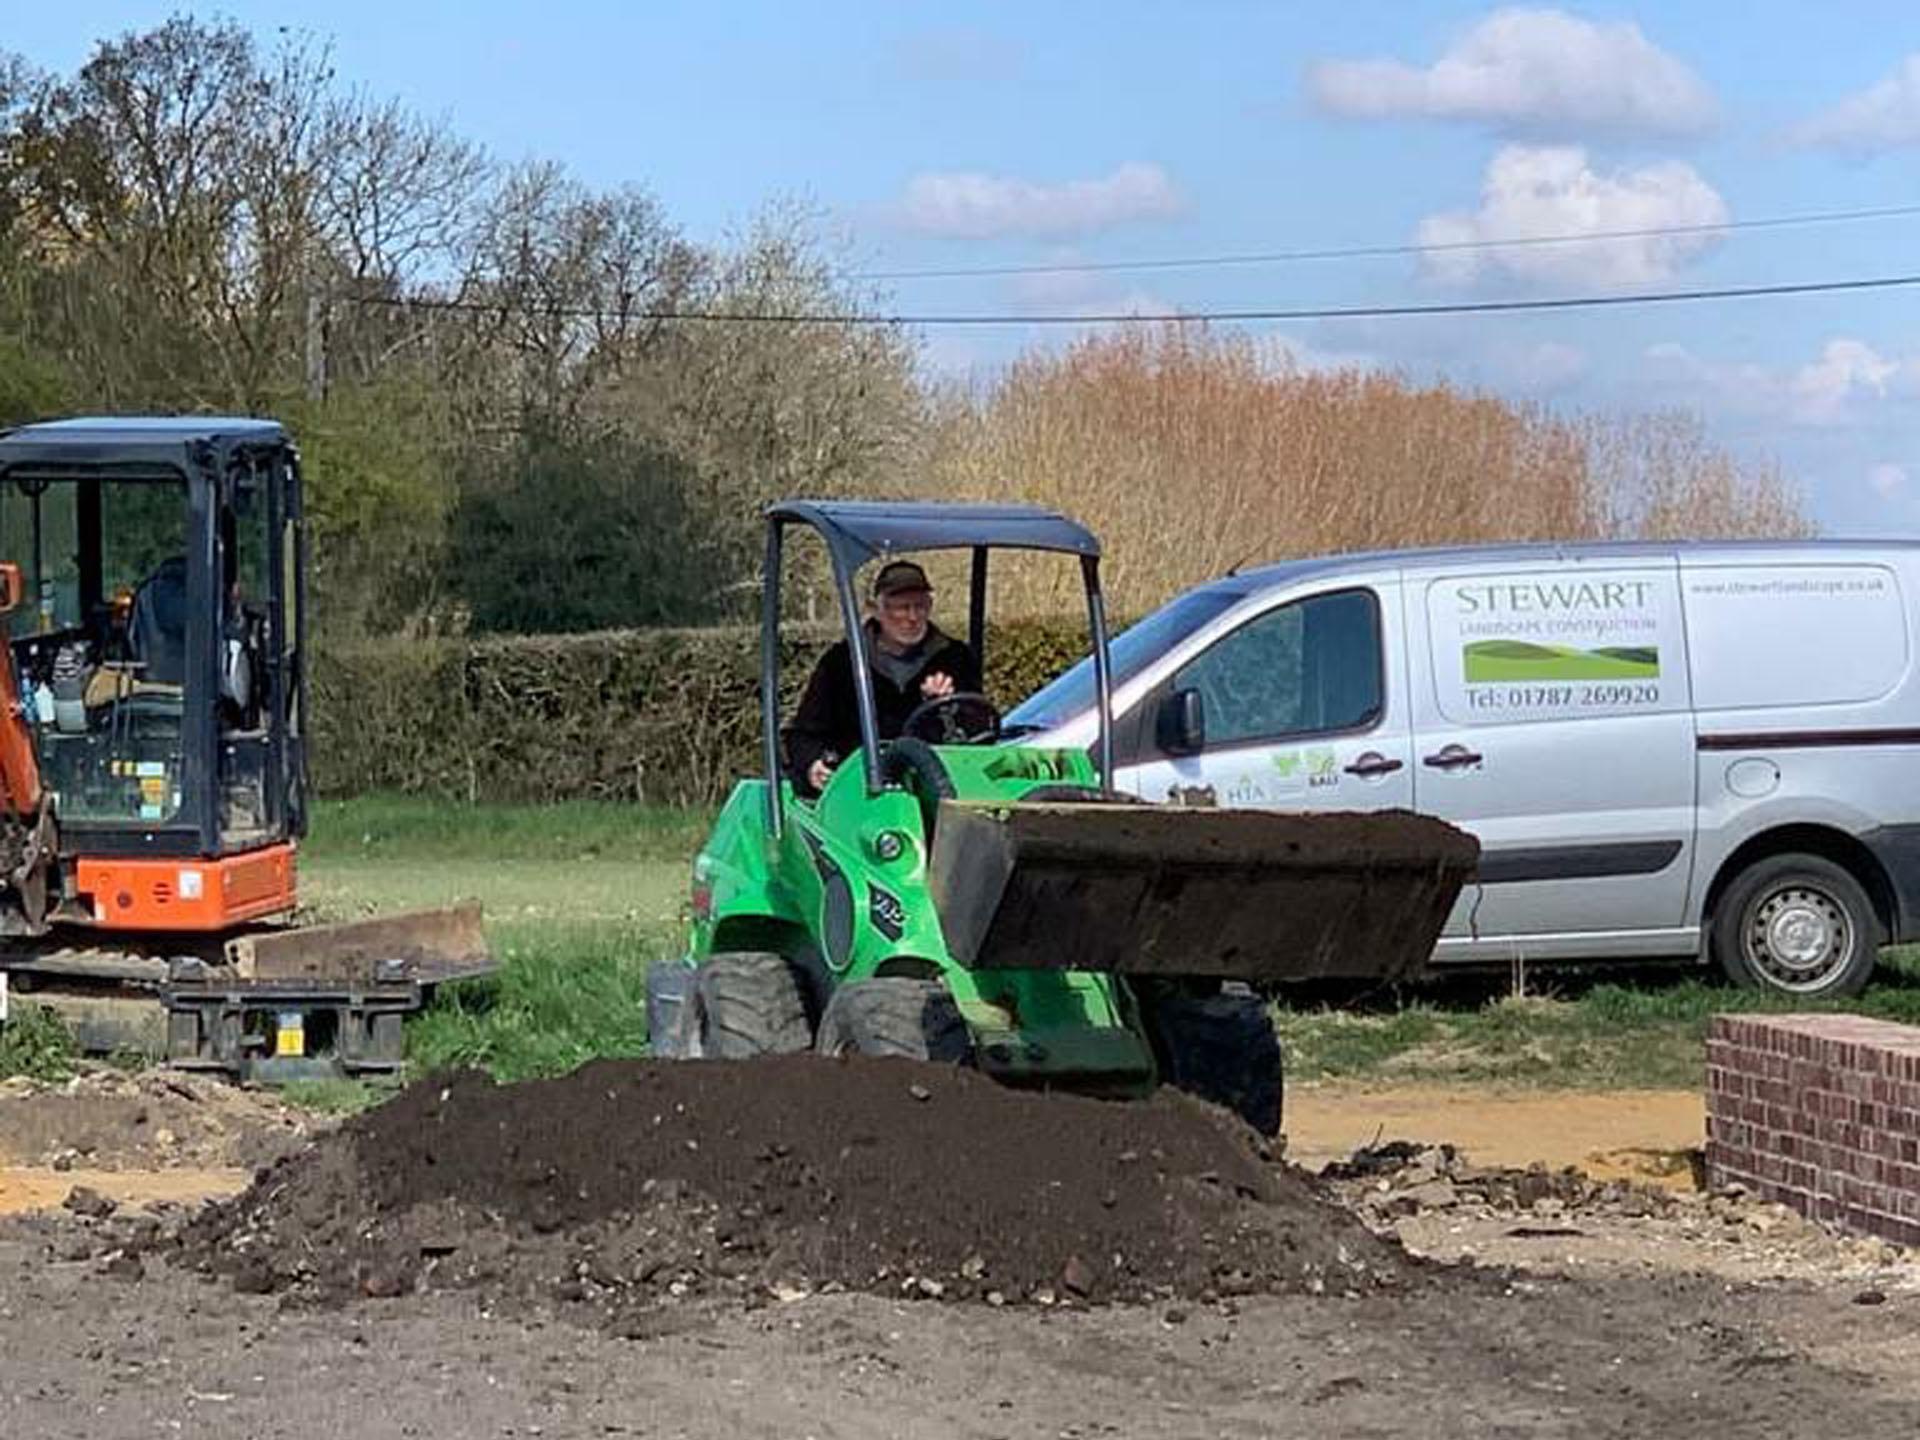 Team - Preparing Ground Cropped